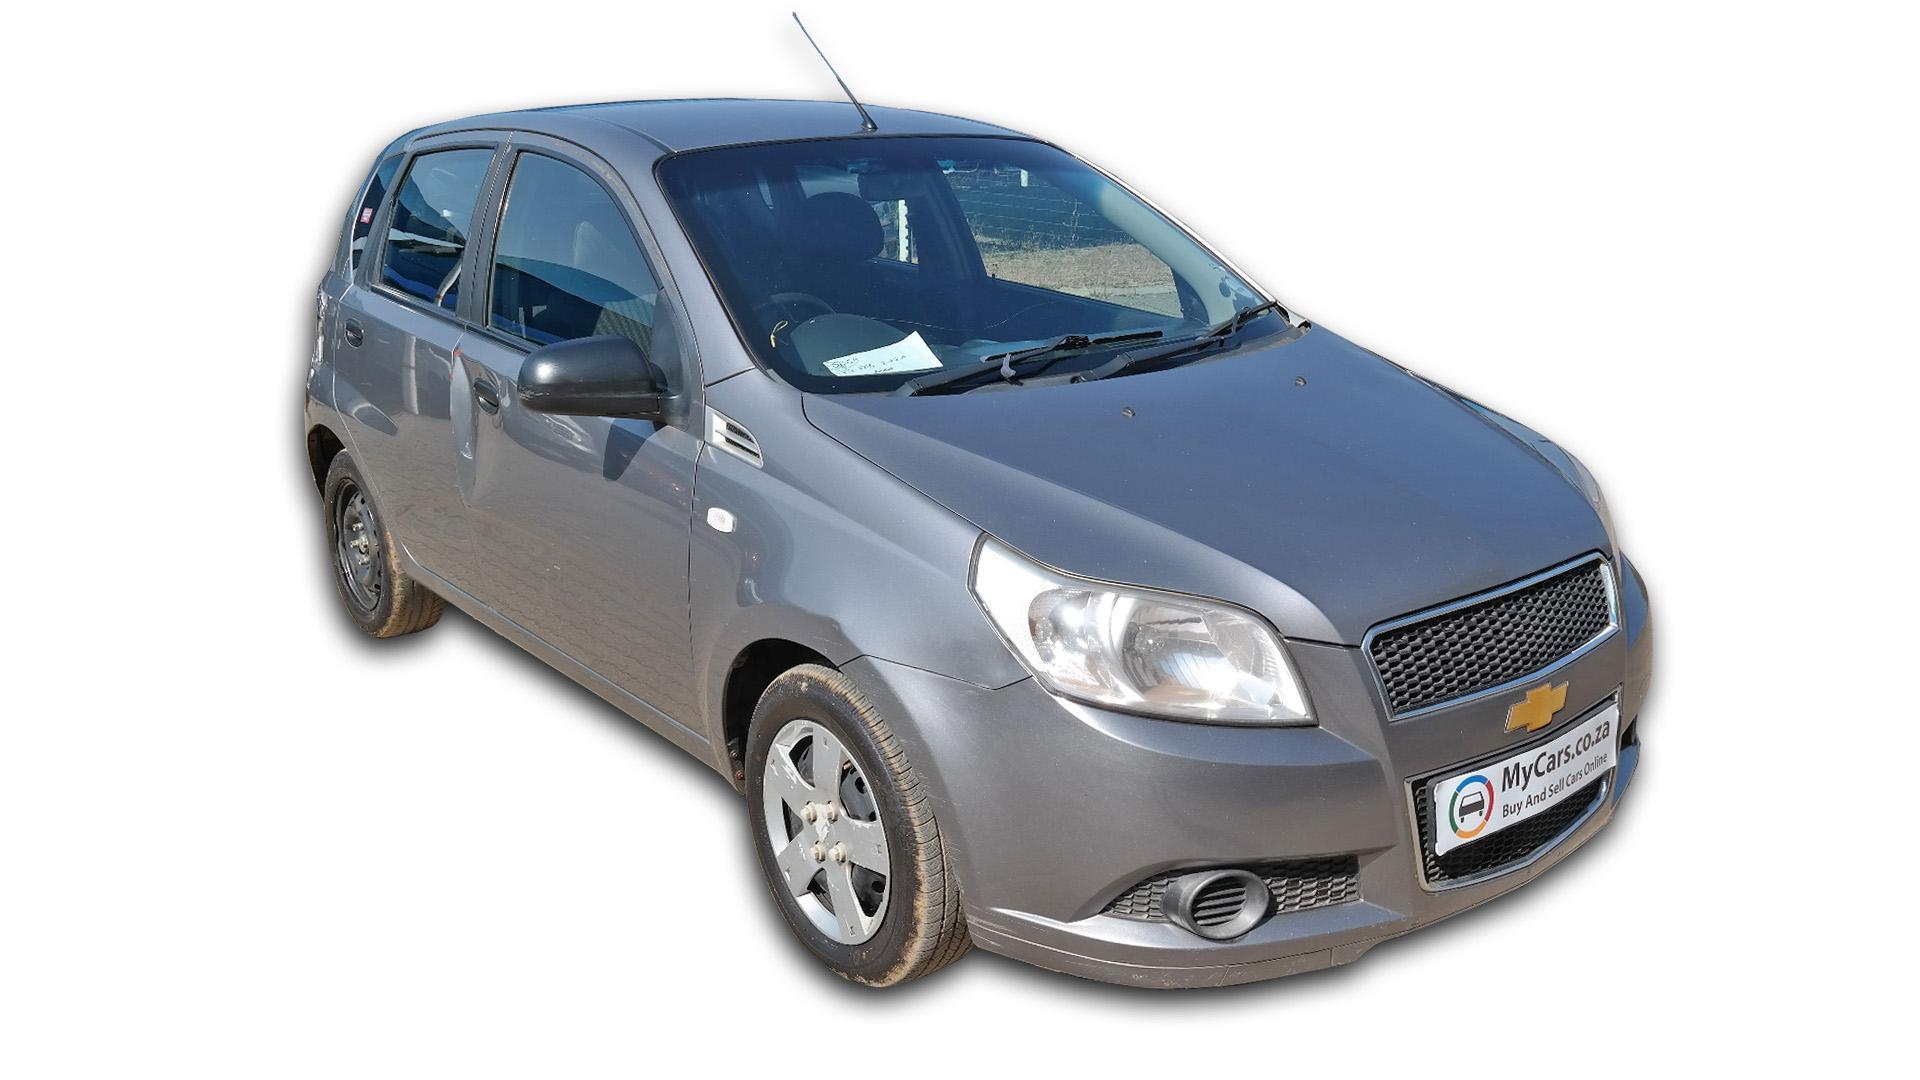 Chevrolet Aveo 1.6L 5DR